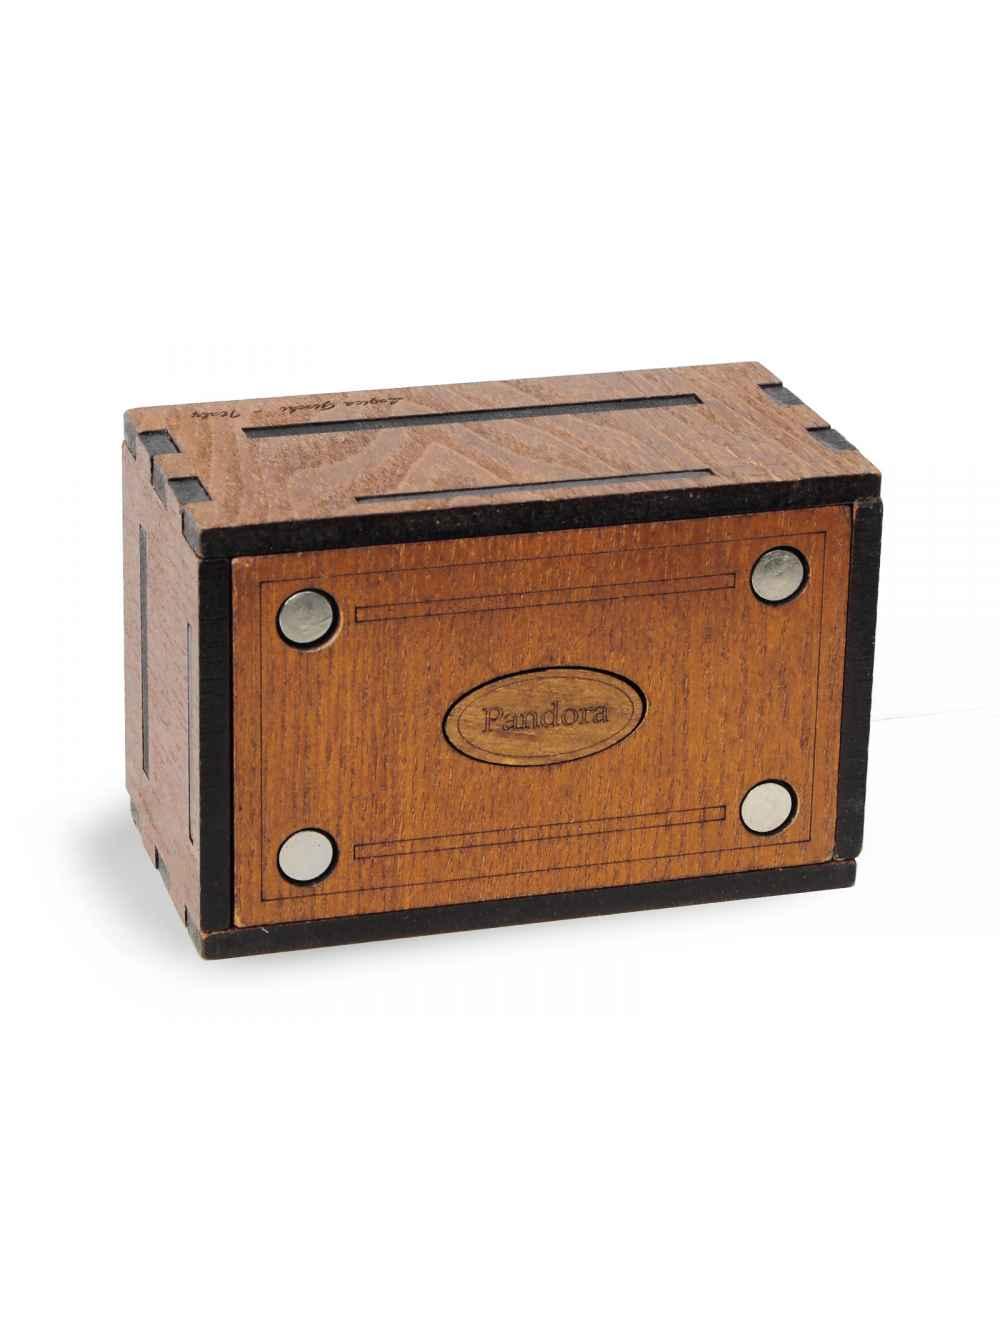 PANDORA BOX - DIE GEHEIME TRUHE (LOGICA SPIELE VERSION)